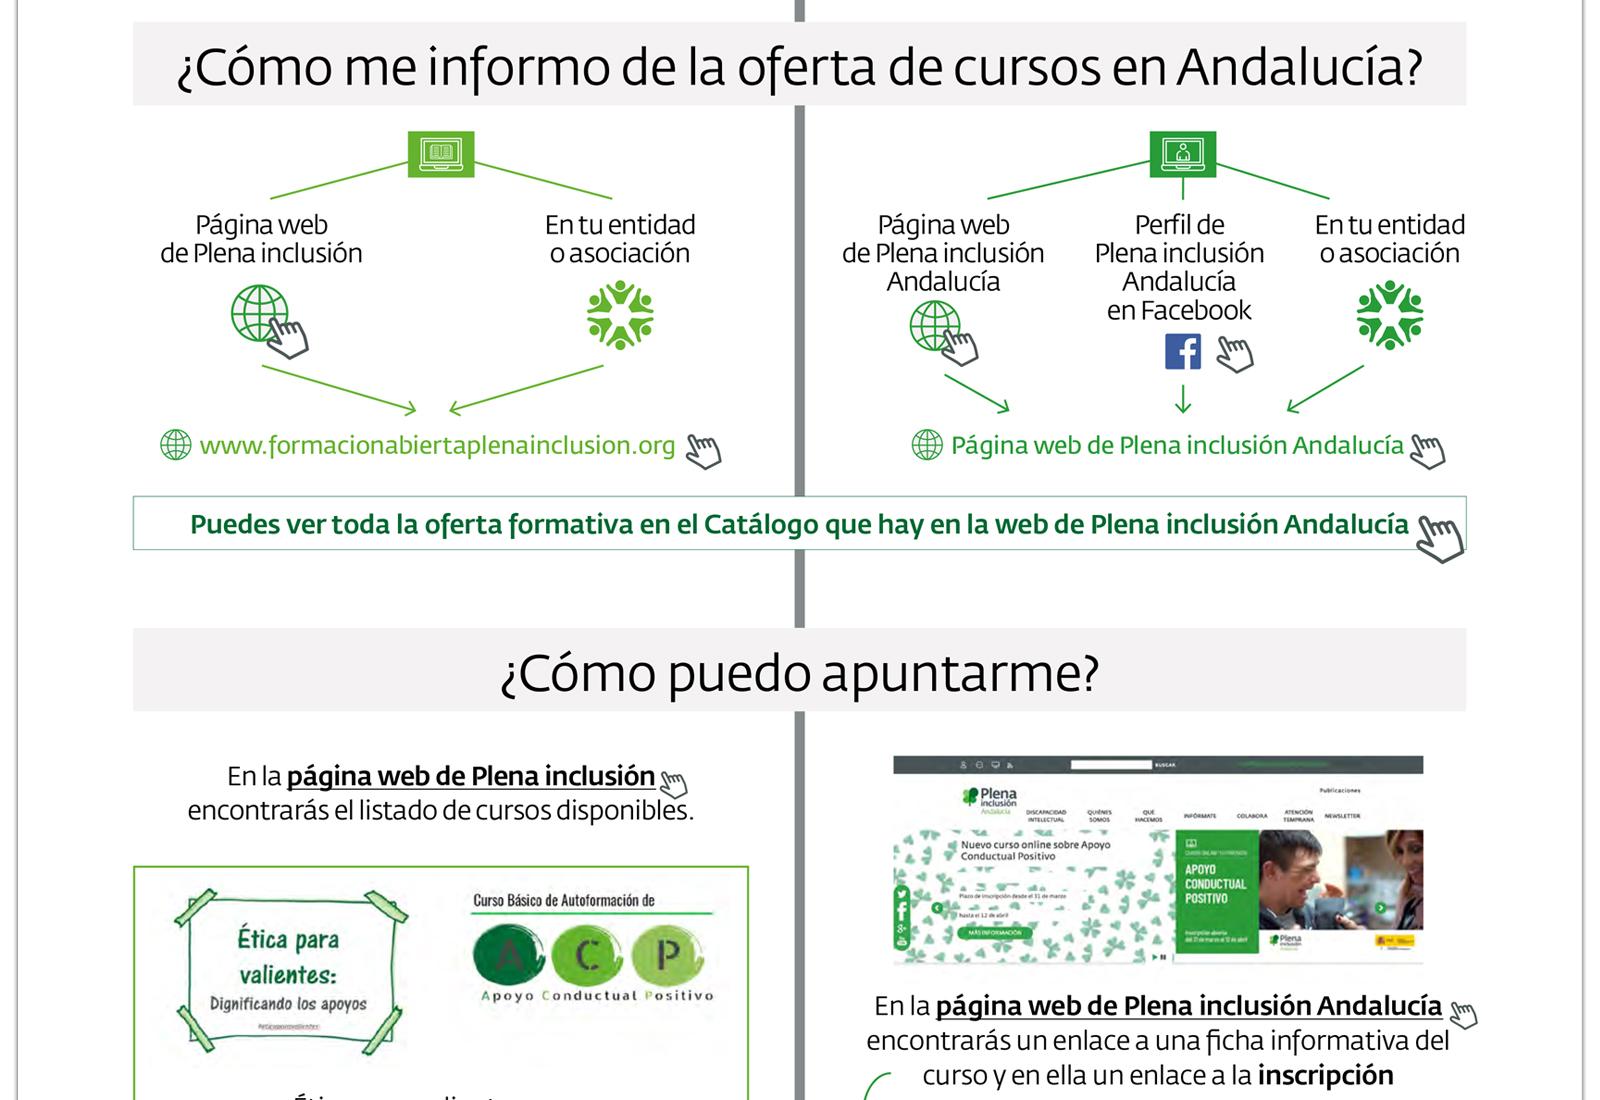 Diseño de infografía oferta formación Plena inclusión Andalucía